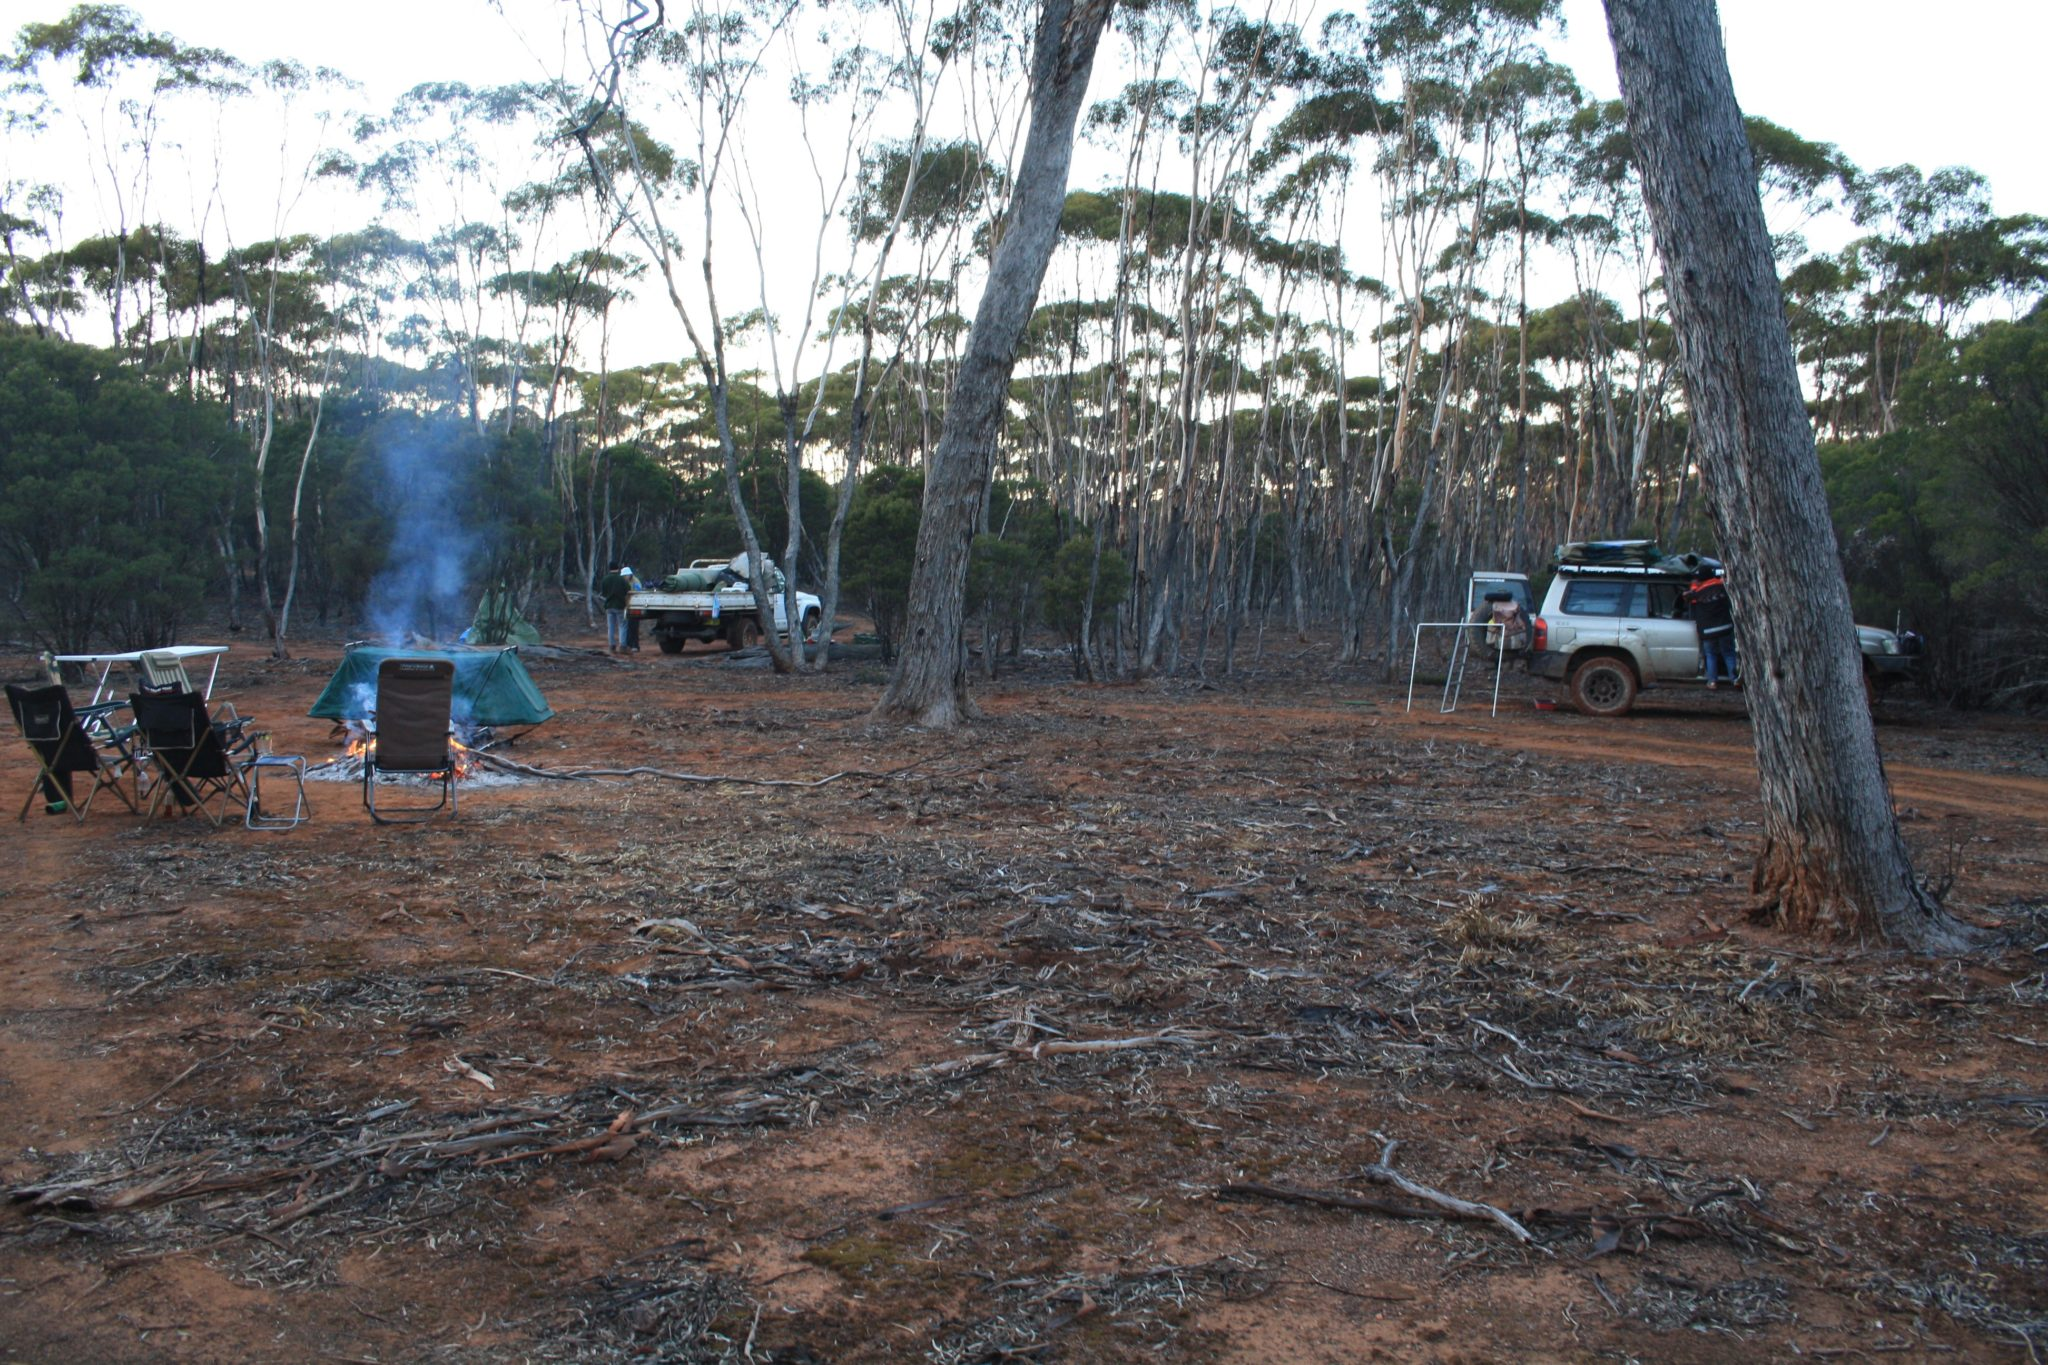 Campsite seven kilometres east of Mount Holland.